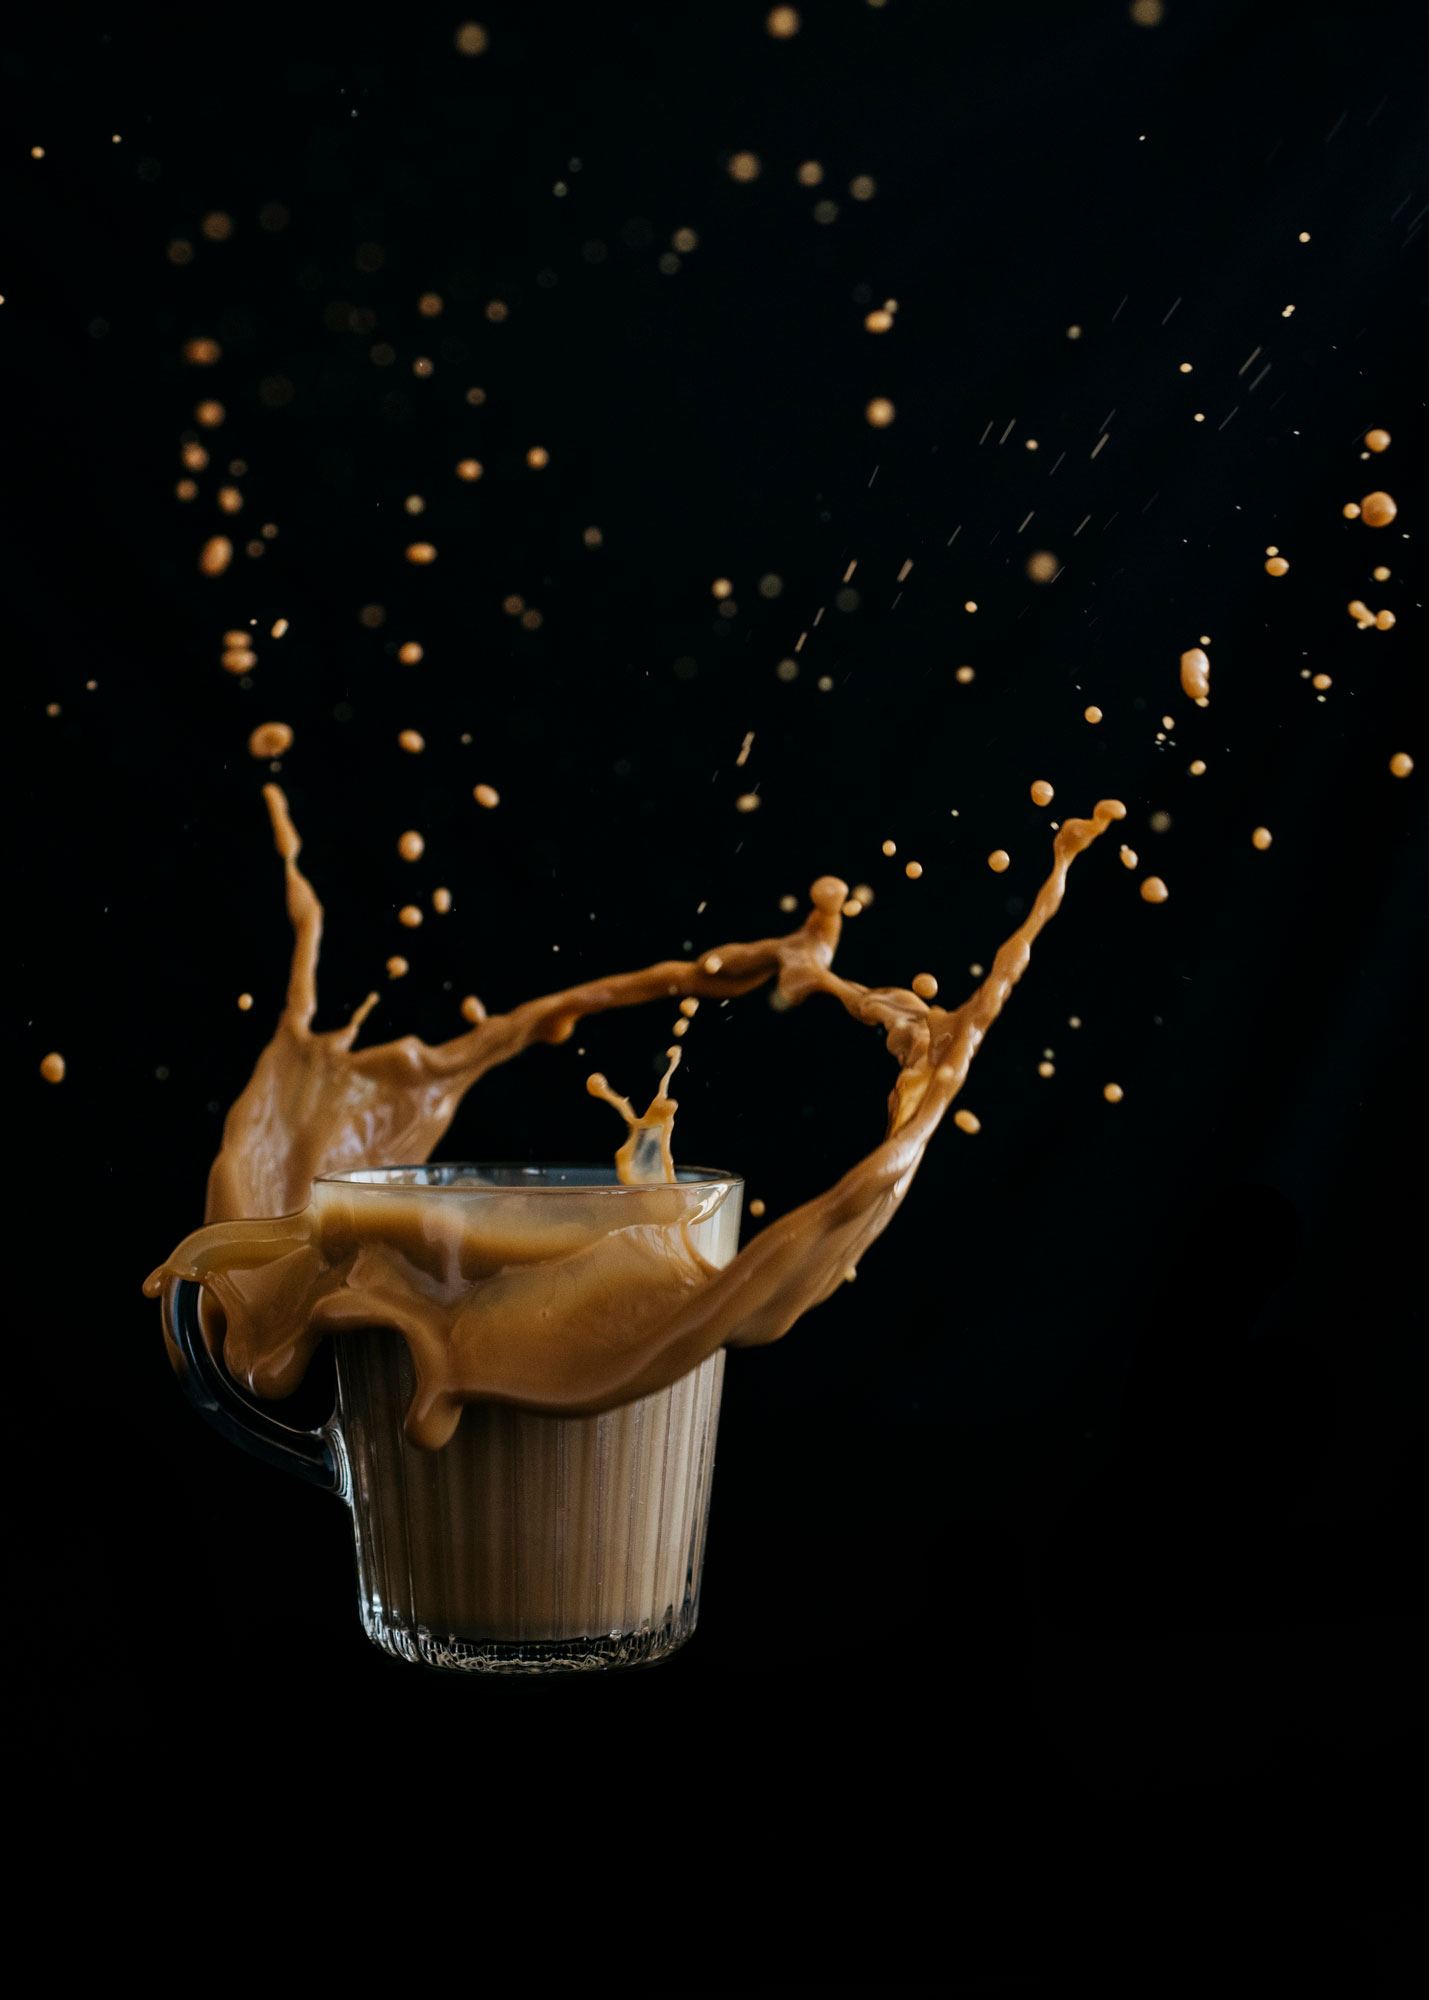 Coffee_splash_Rebecca_Peloquin_Los_Angeles_Beverage_Photographer_004.JPG